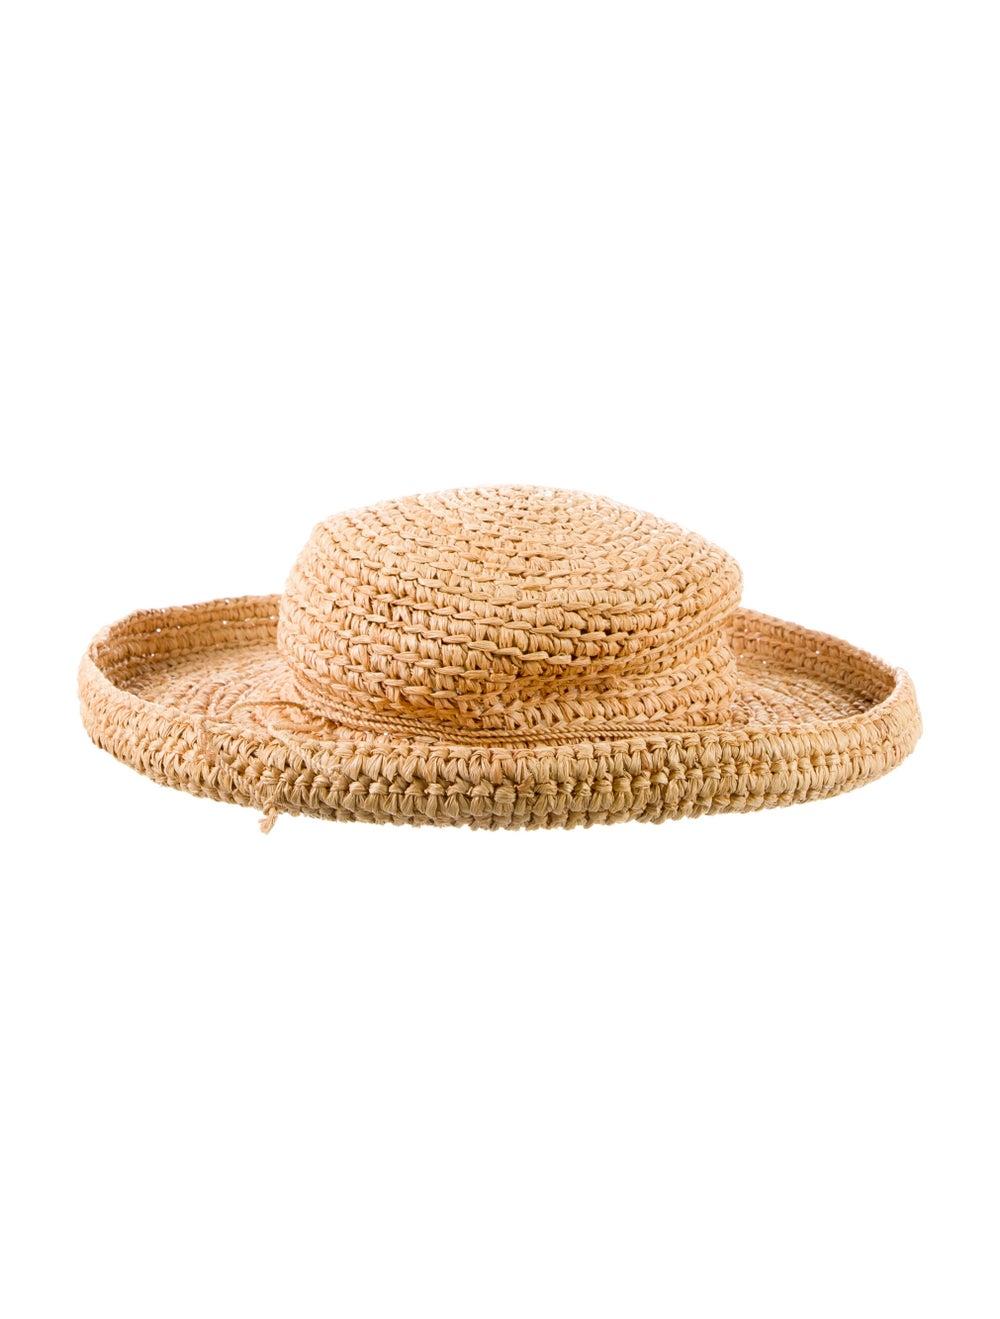 Kaminski Straw Wide Brim Hat Brown - image 2